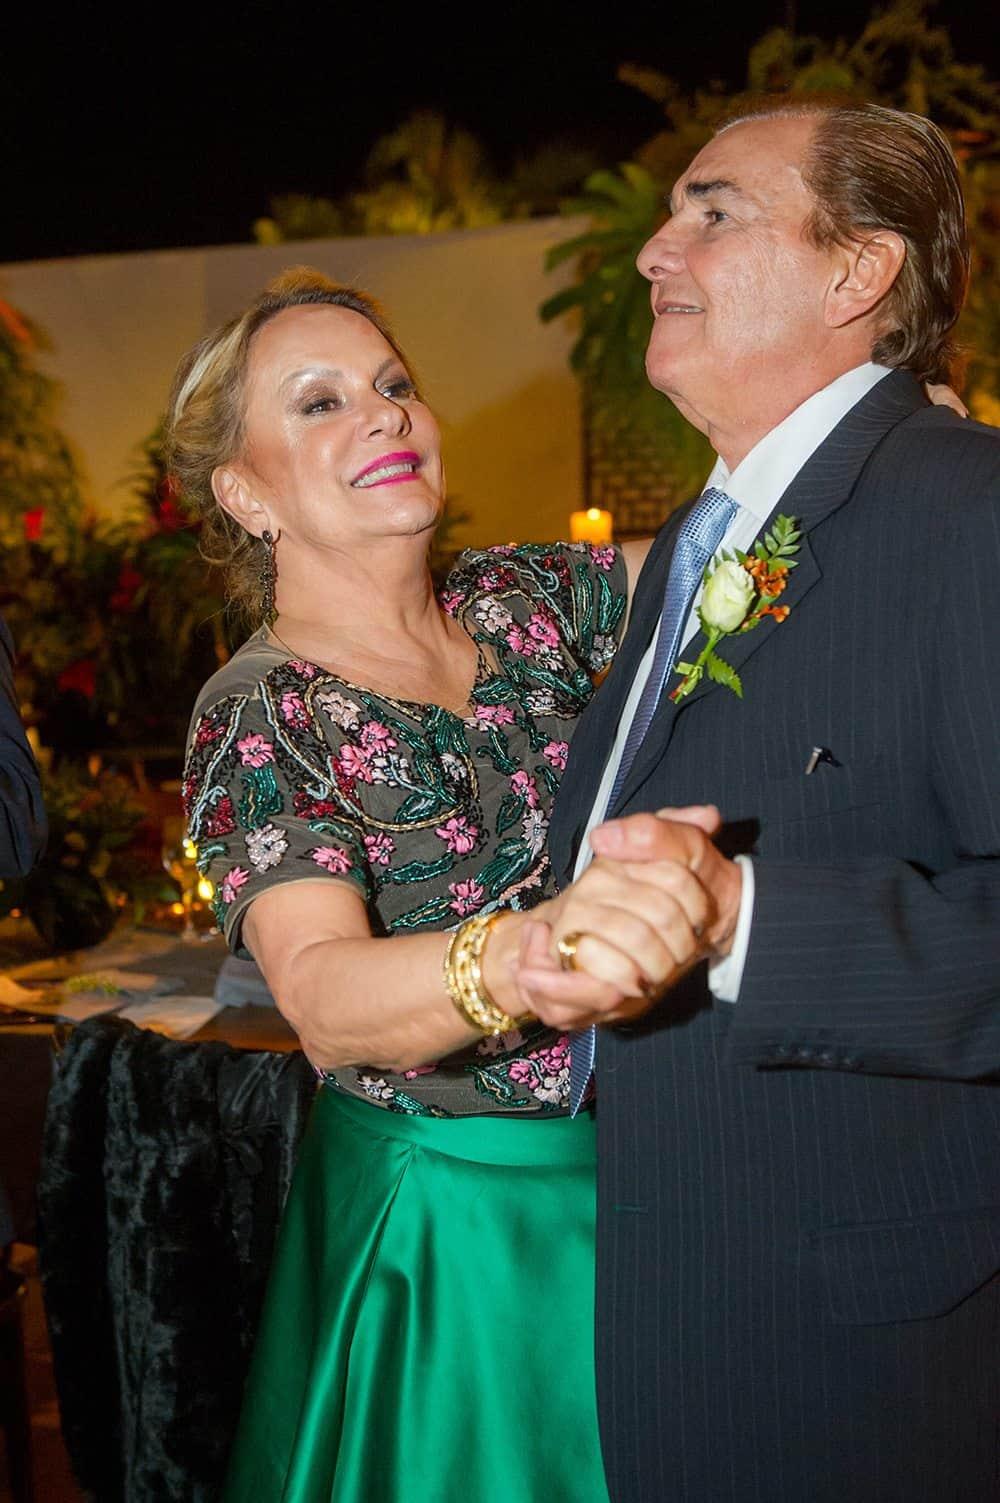 casamento-isadora-e-breno-caseme-foto-marina-fava-fotografia-30